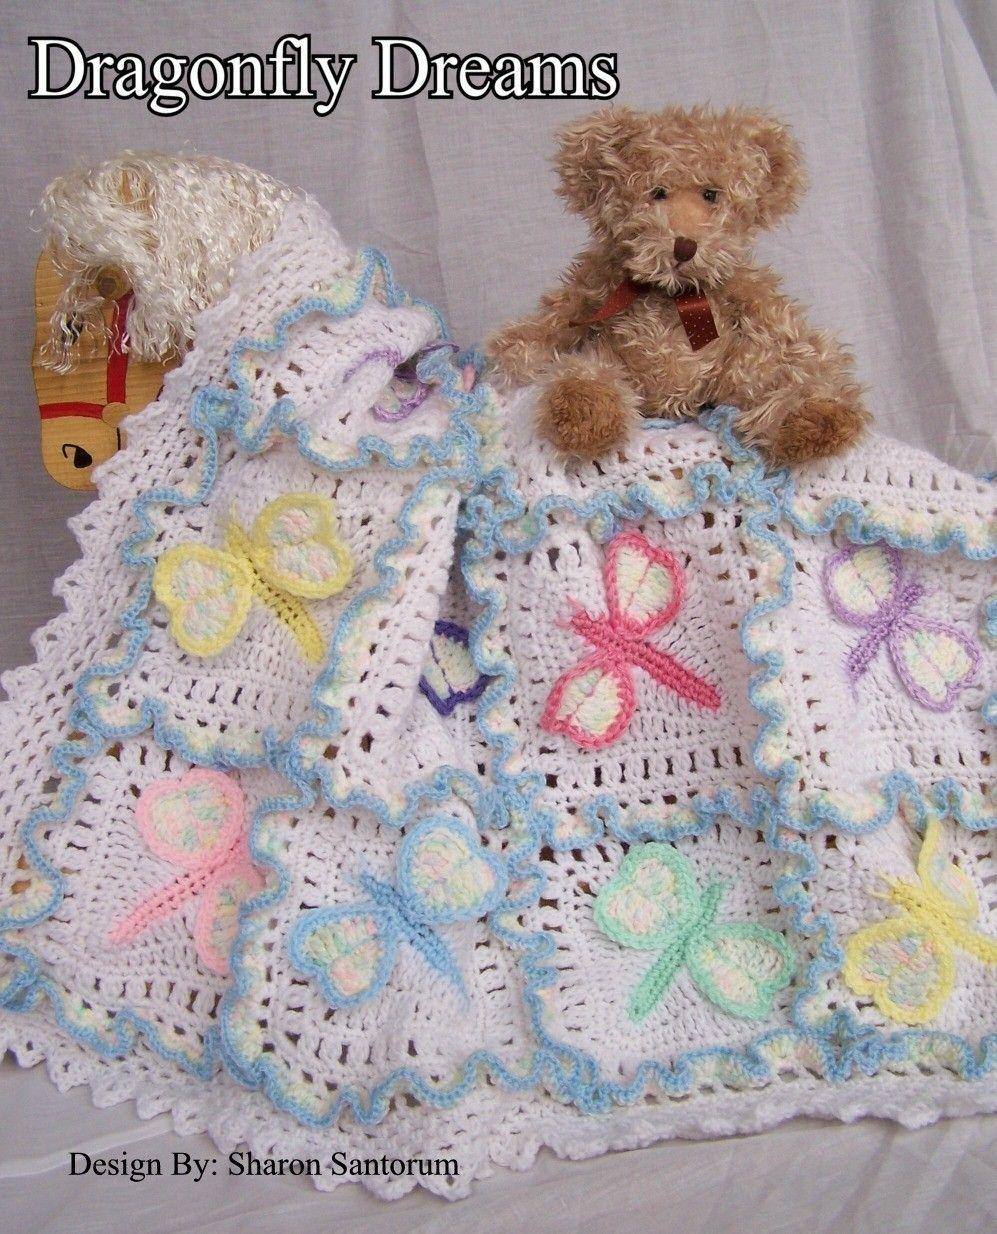 Crochet Caterpillar Baby Blanket Pattern : Dragonfly Dreams Baby Afghan Baby blanket crochet